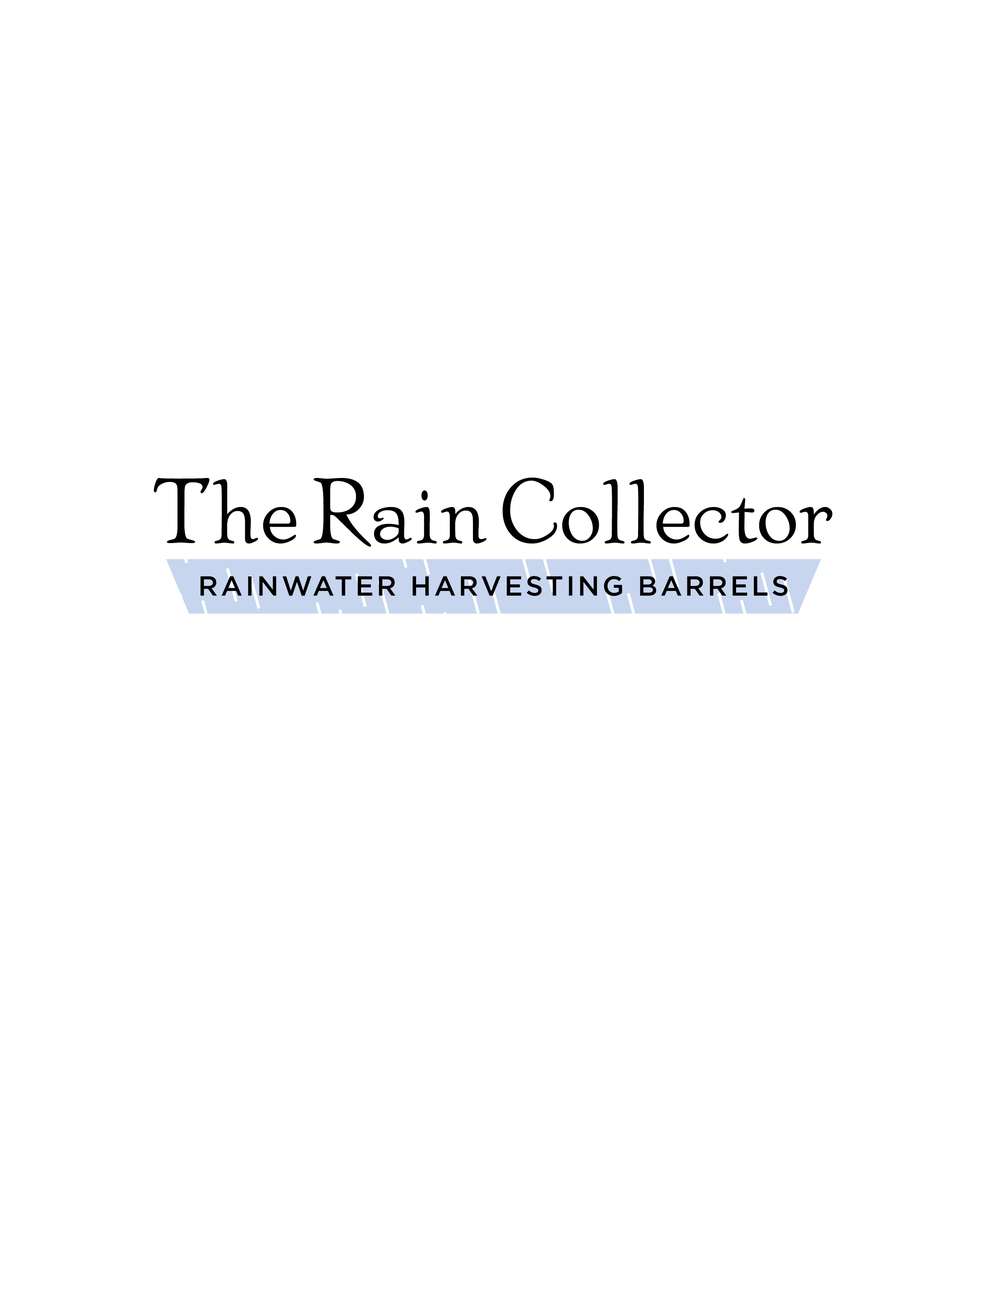 rainwater.logo.jpg